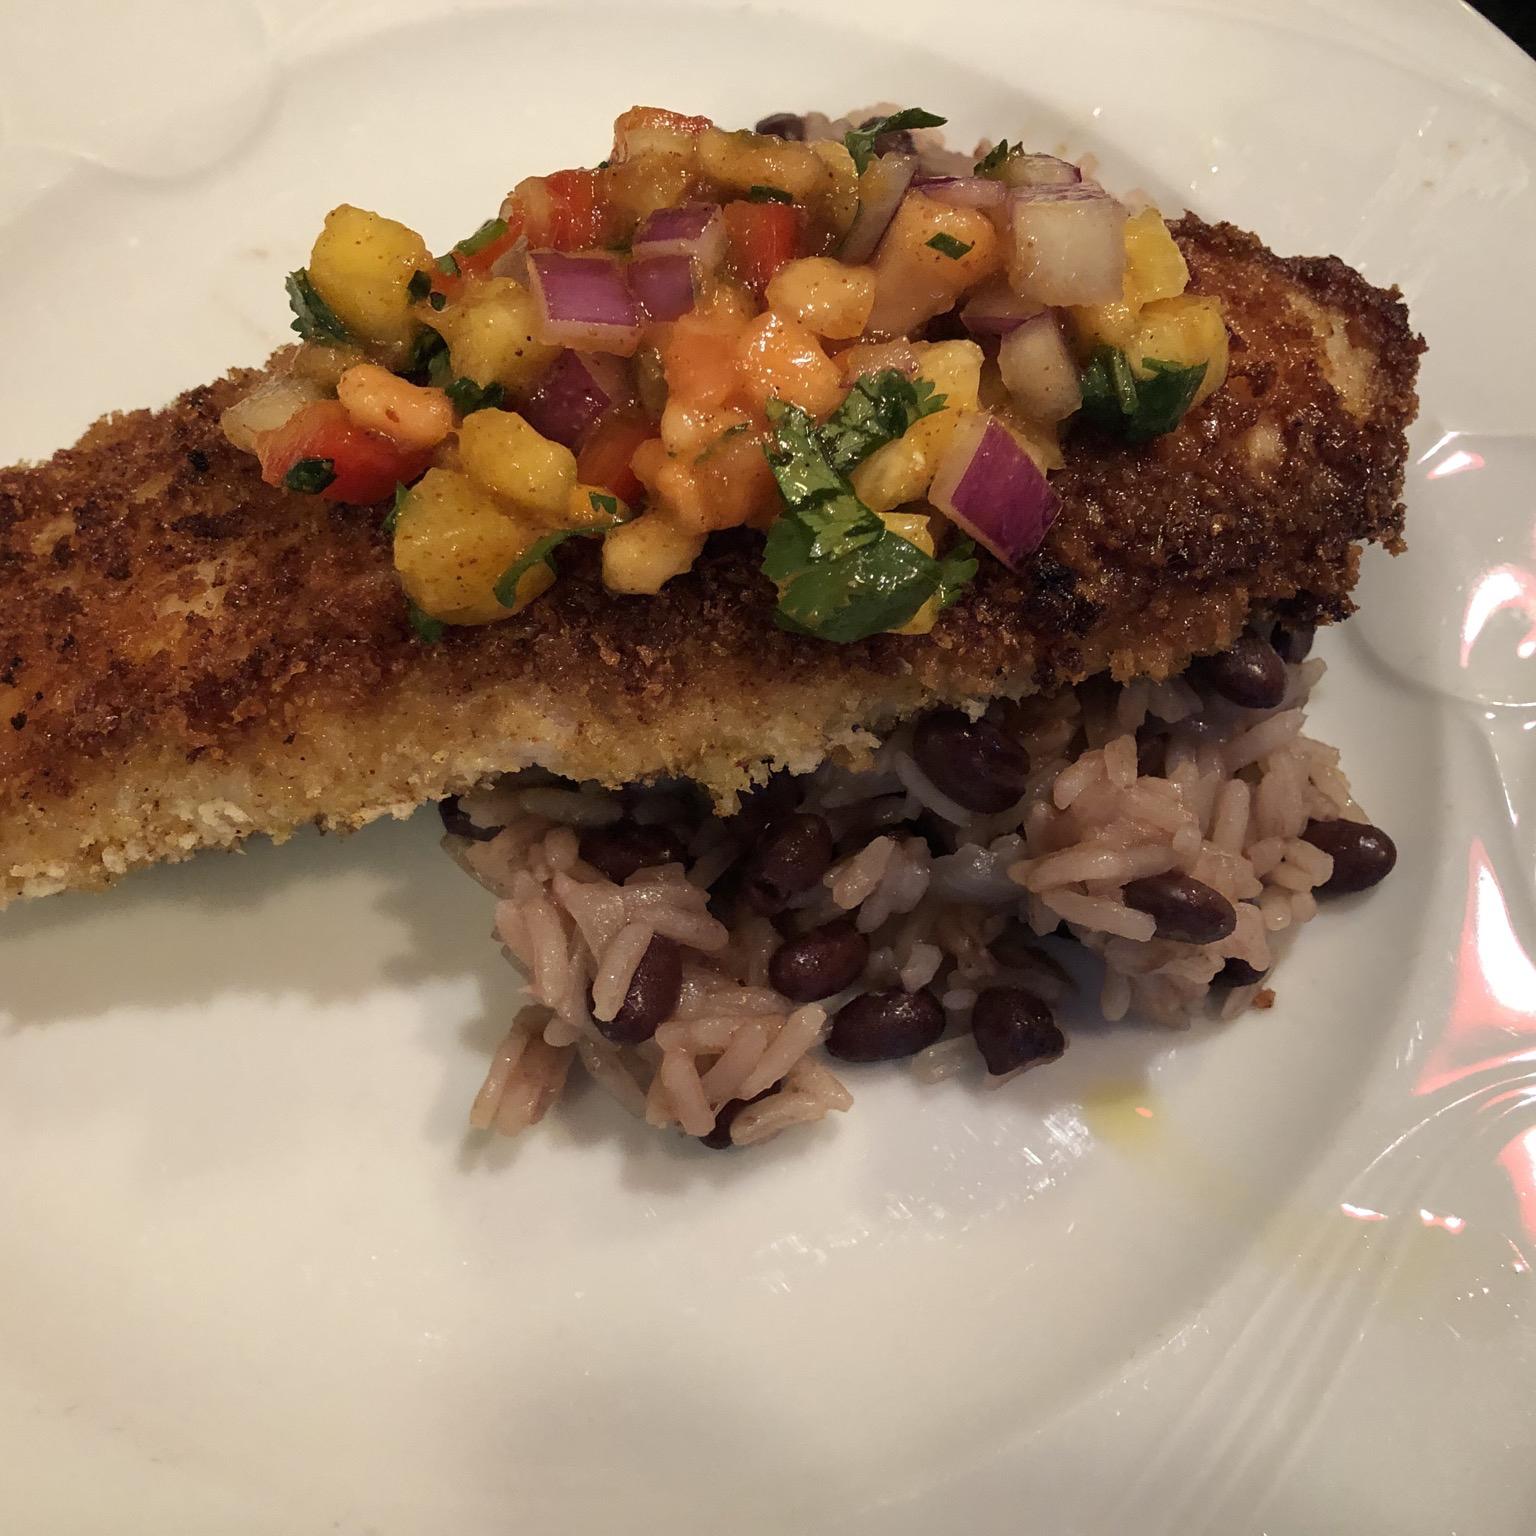 Caribbean Fish With Mango Salsa image